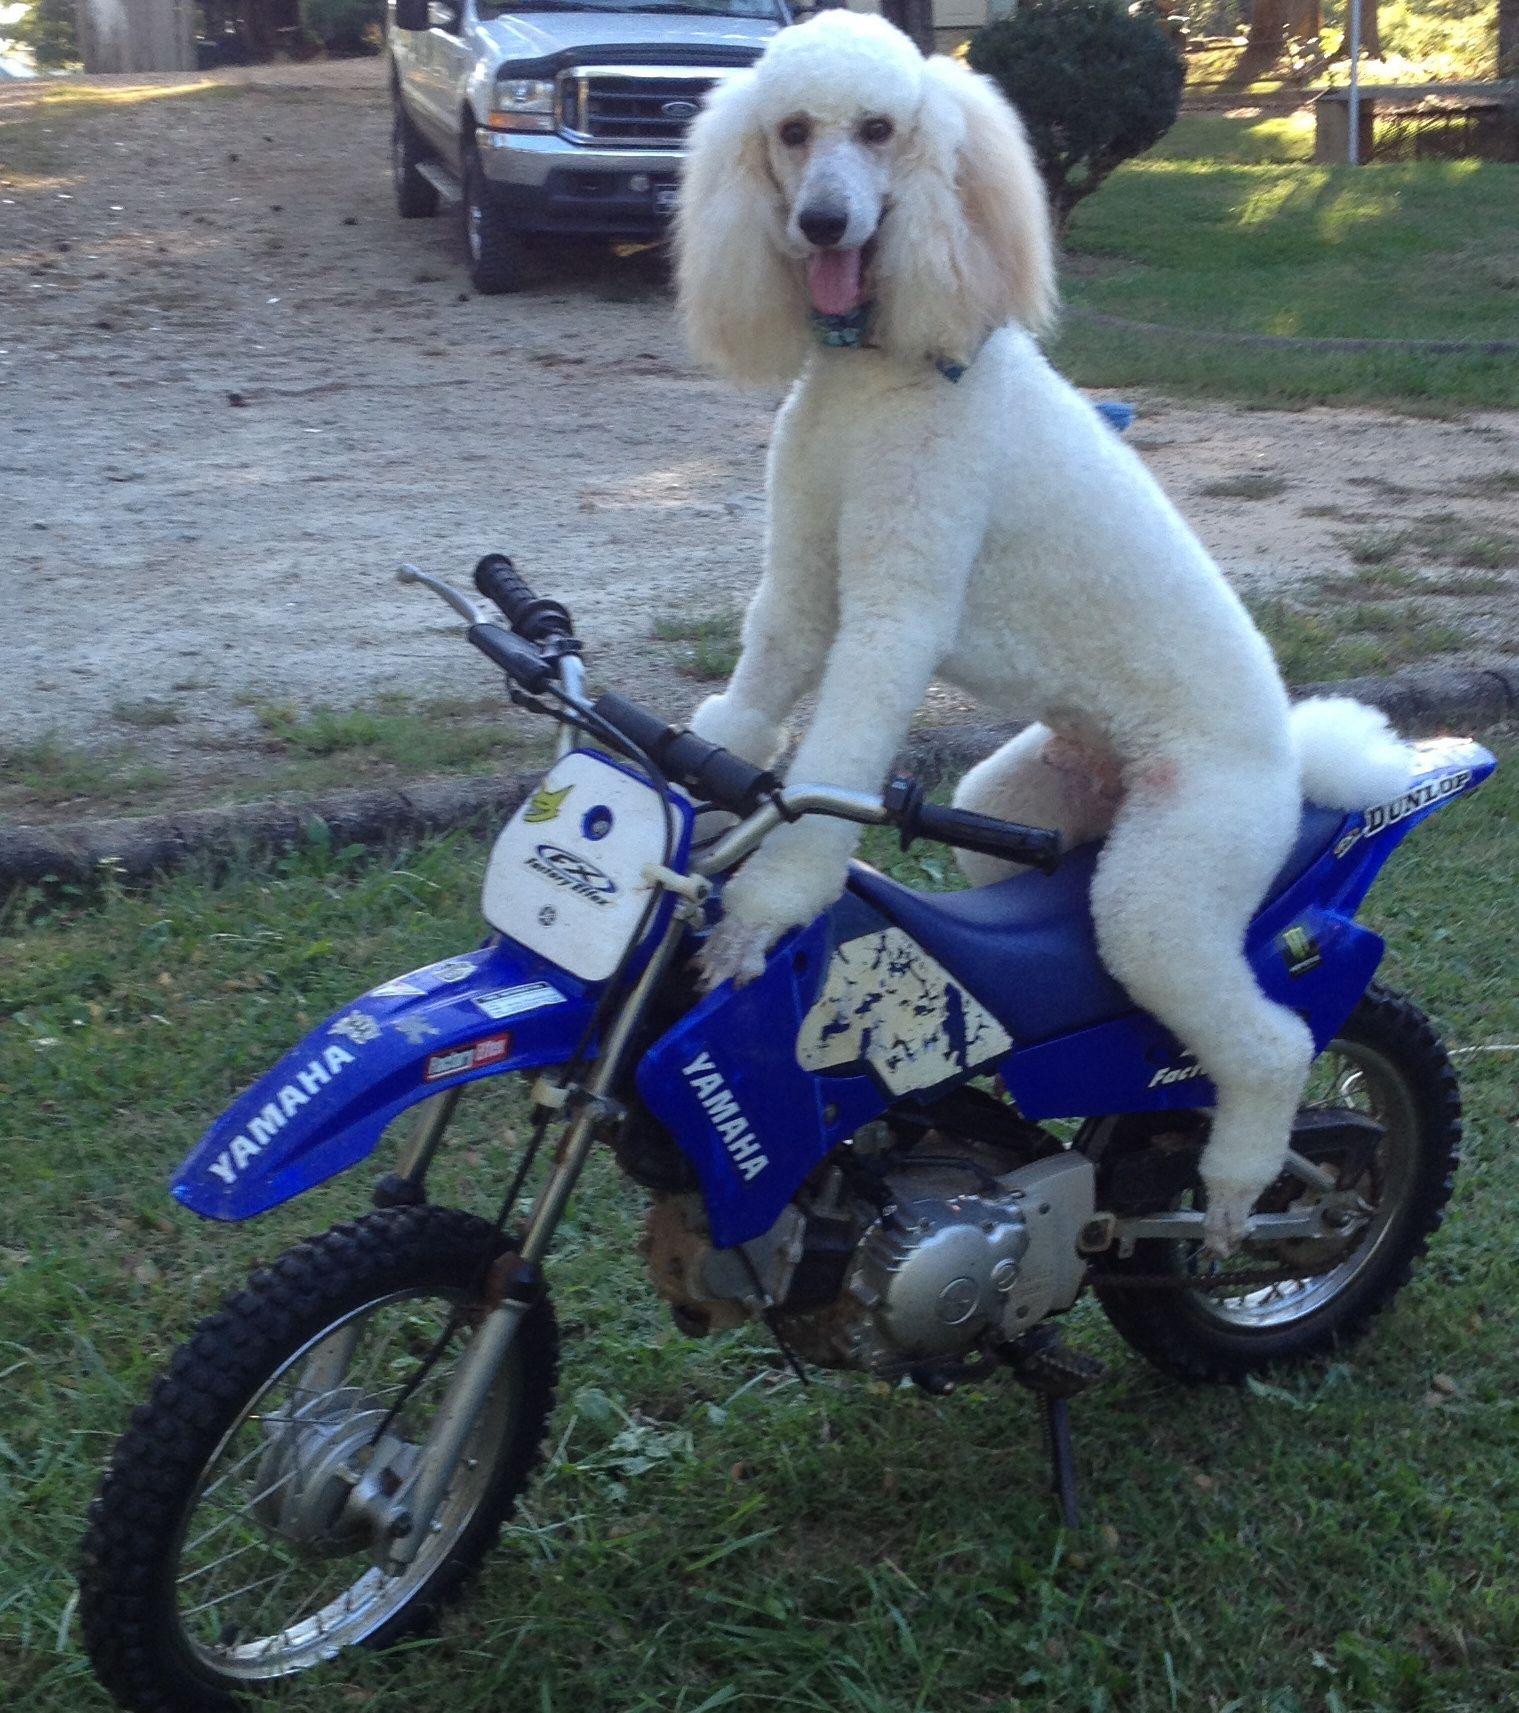 The Coolest Dog Ever Rusty The Standard Poodle Loves To Ride Anything Dirt Bikes 4 Wheeler Golf Cart Car Or Truck Poodle Dog Poodle Beloved Dog